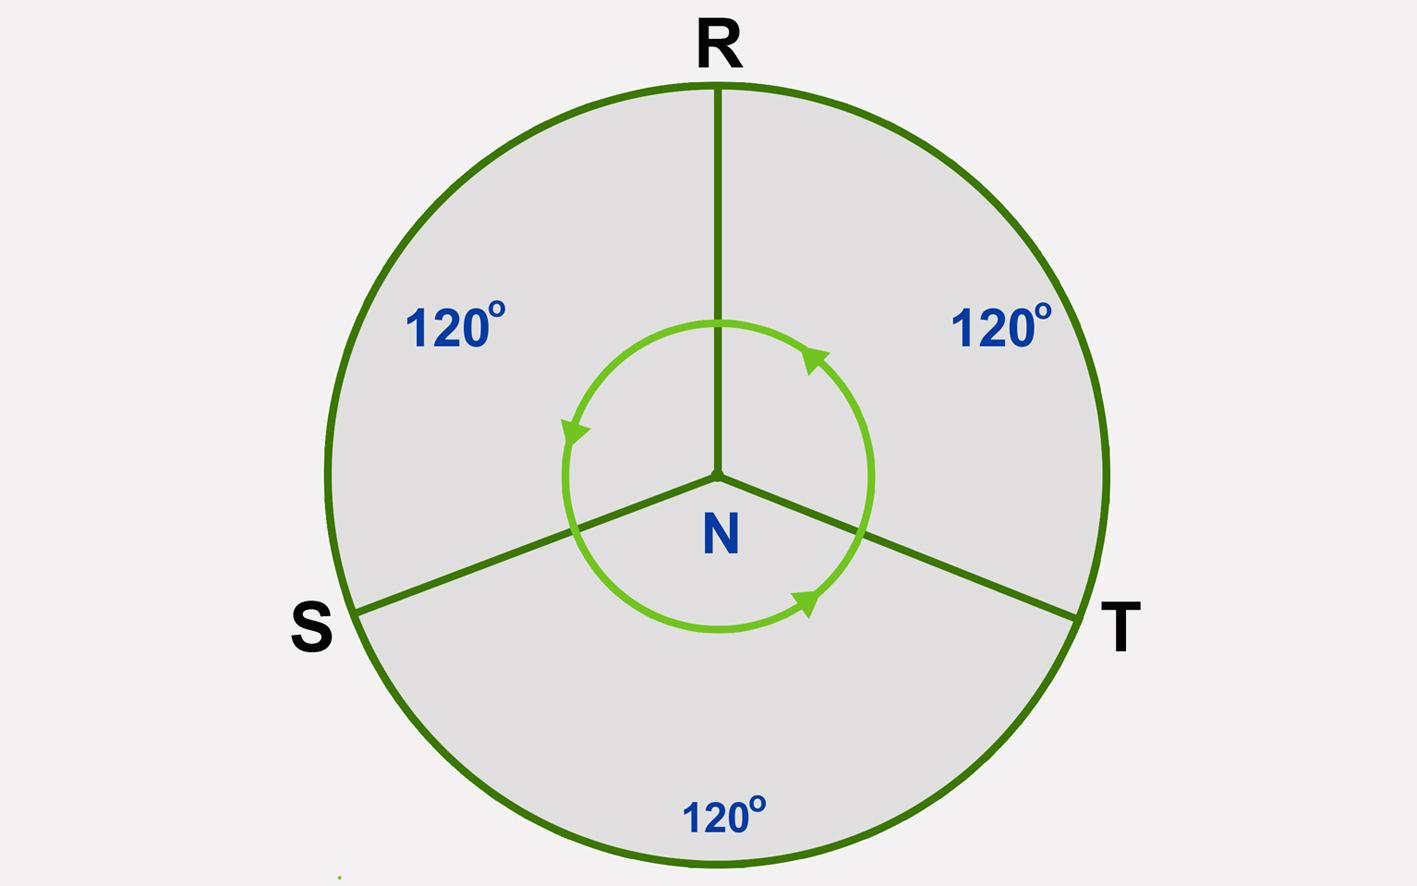 Rumus Listrik 3 Phase 380 Volt Ke 1 220 Tukang Wiring Diagrams